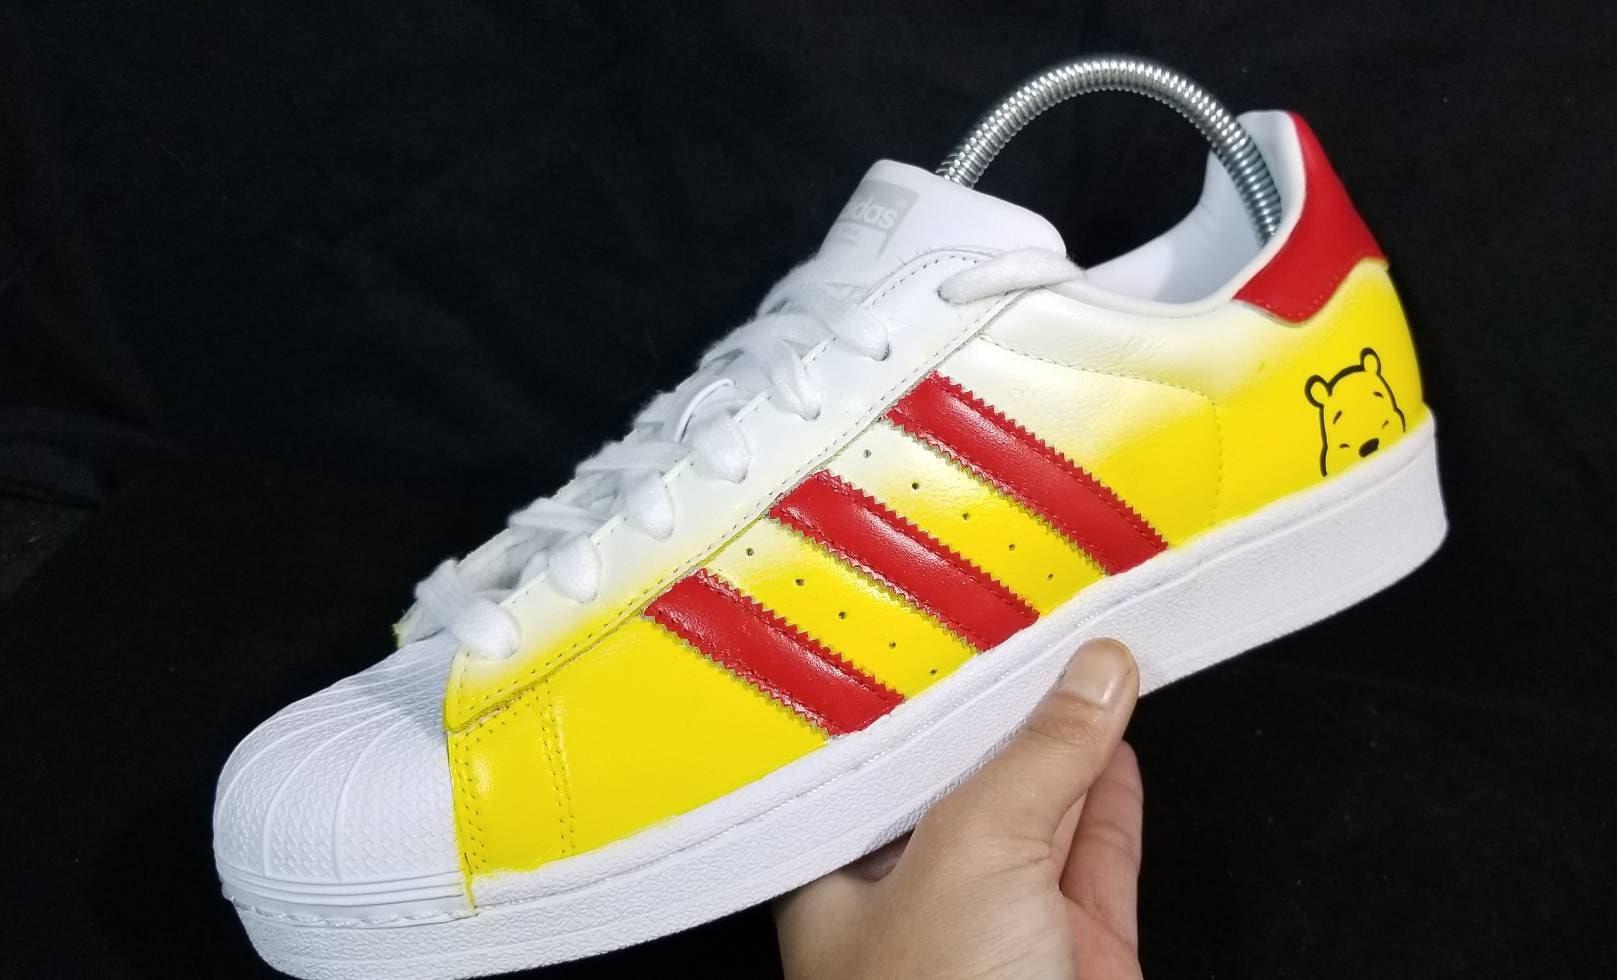 Adidas Superstar Winnie the Pooh Collab Custom shoes  9b5b46db4